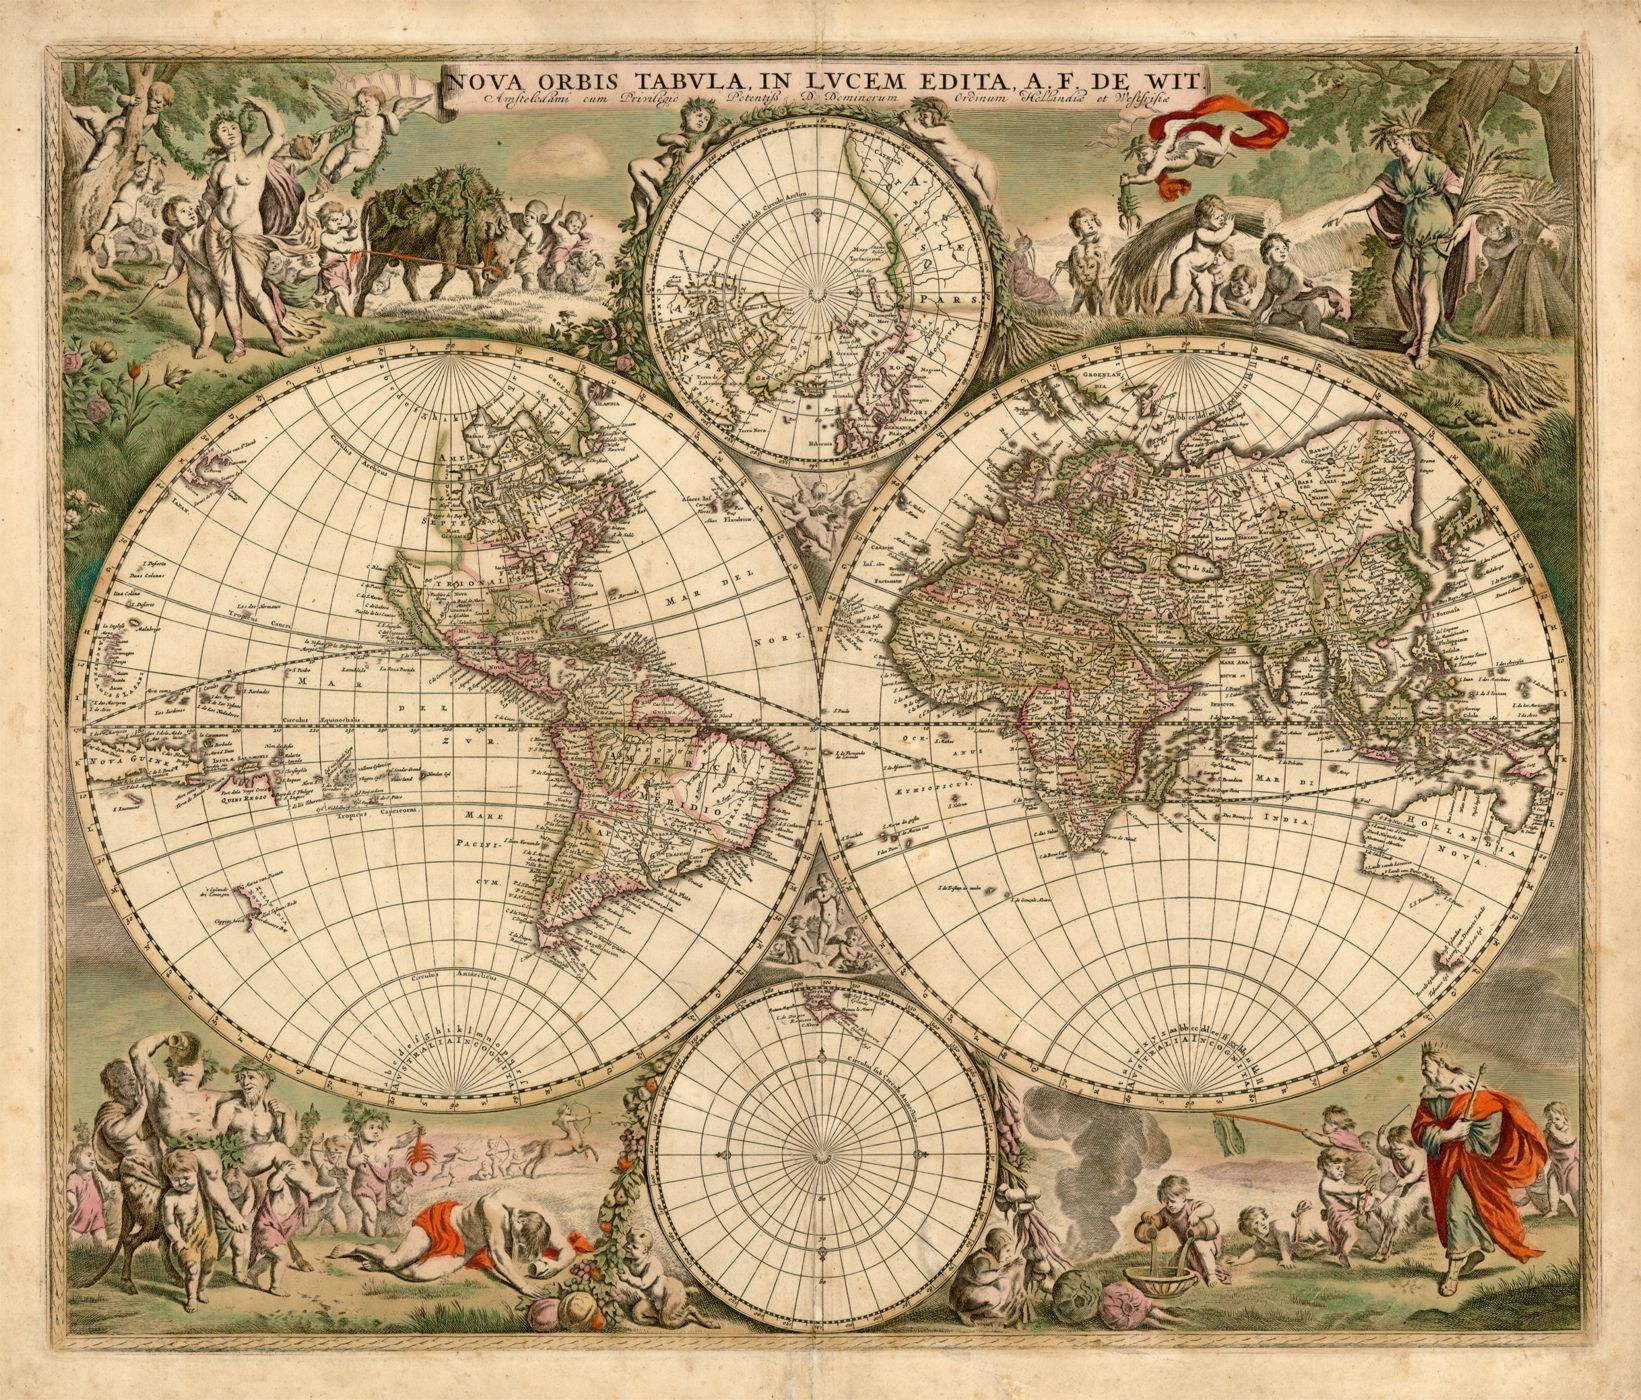 Mapas Antiguos - Megapost | Mapas, Mapas antiguos y Imágenes de mapas